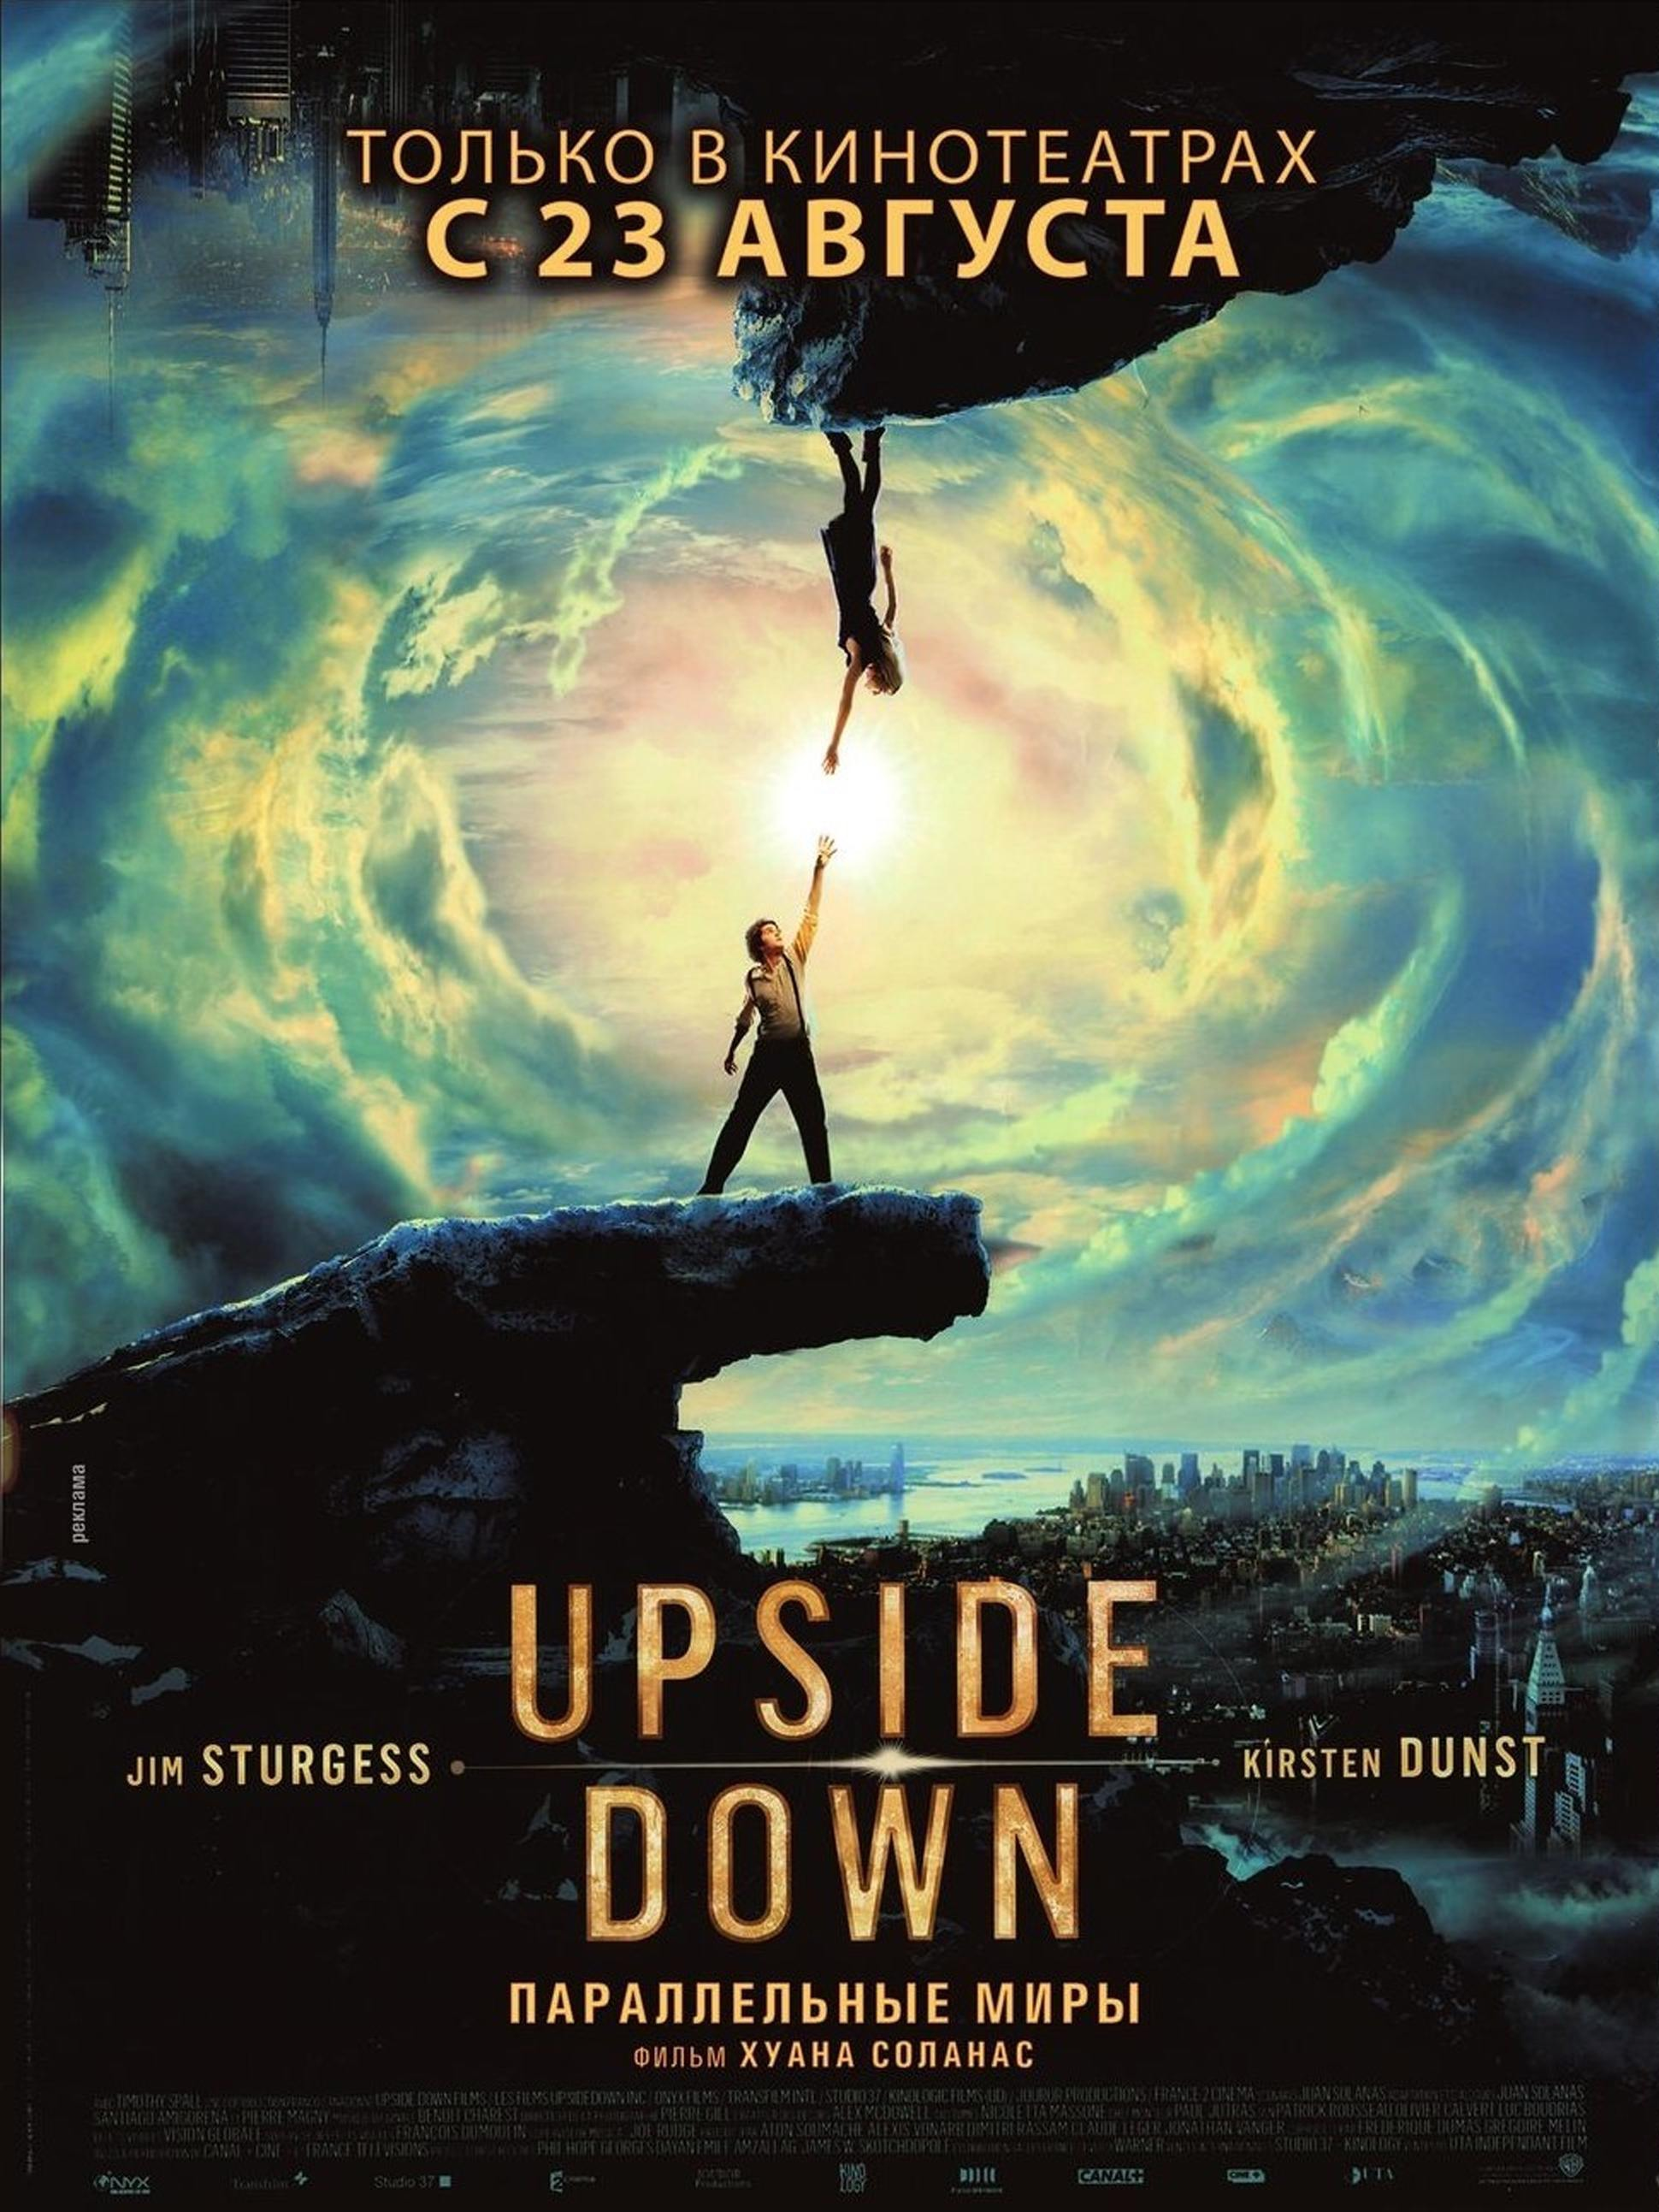 Upside Down - Movie Poster #2 (Original)